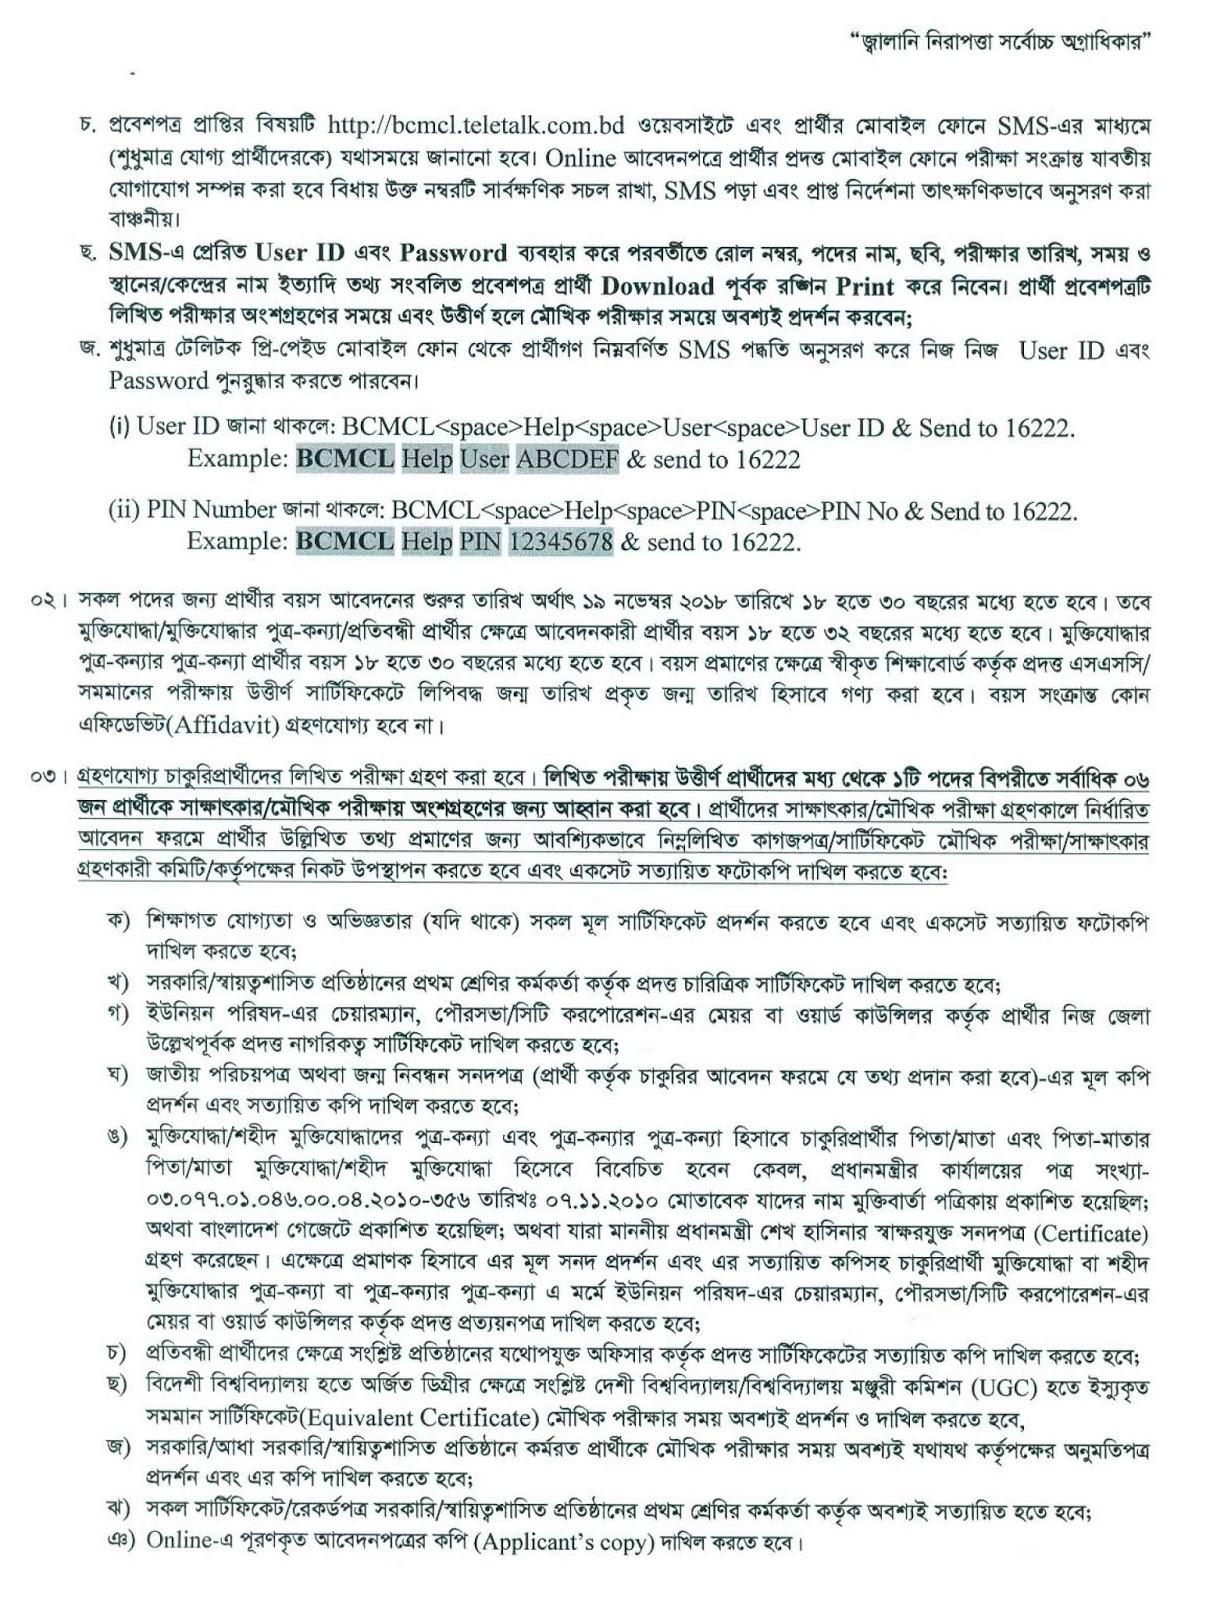 Barapukuria Coal Mining Company Limited (BCMCL) Job Circular 2018